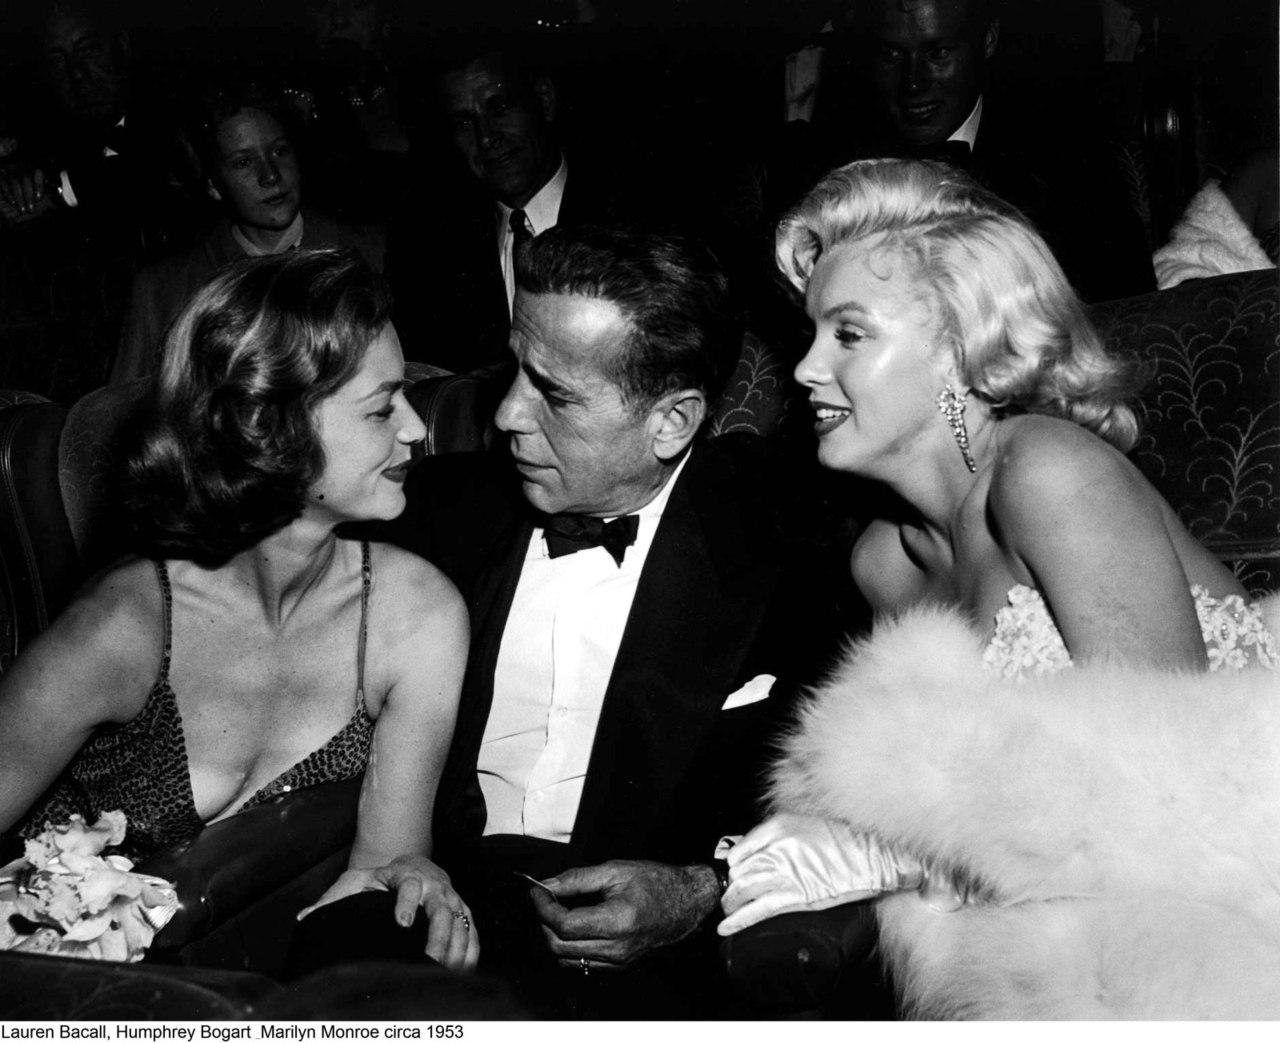 http://4.bp.blogspot.com/-R_Ap7cCR2Rs/TwS43ziRKxI/AAAAAAAABXg/4L9FzWmUrx4/s1600/Lauren+Bacall%252C+Humphrey+Bogart+%2526+Marilyn+Monroe.jpg